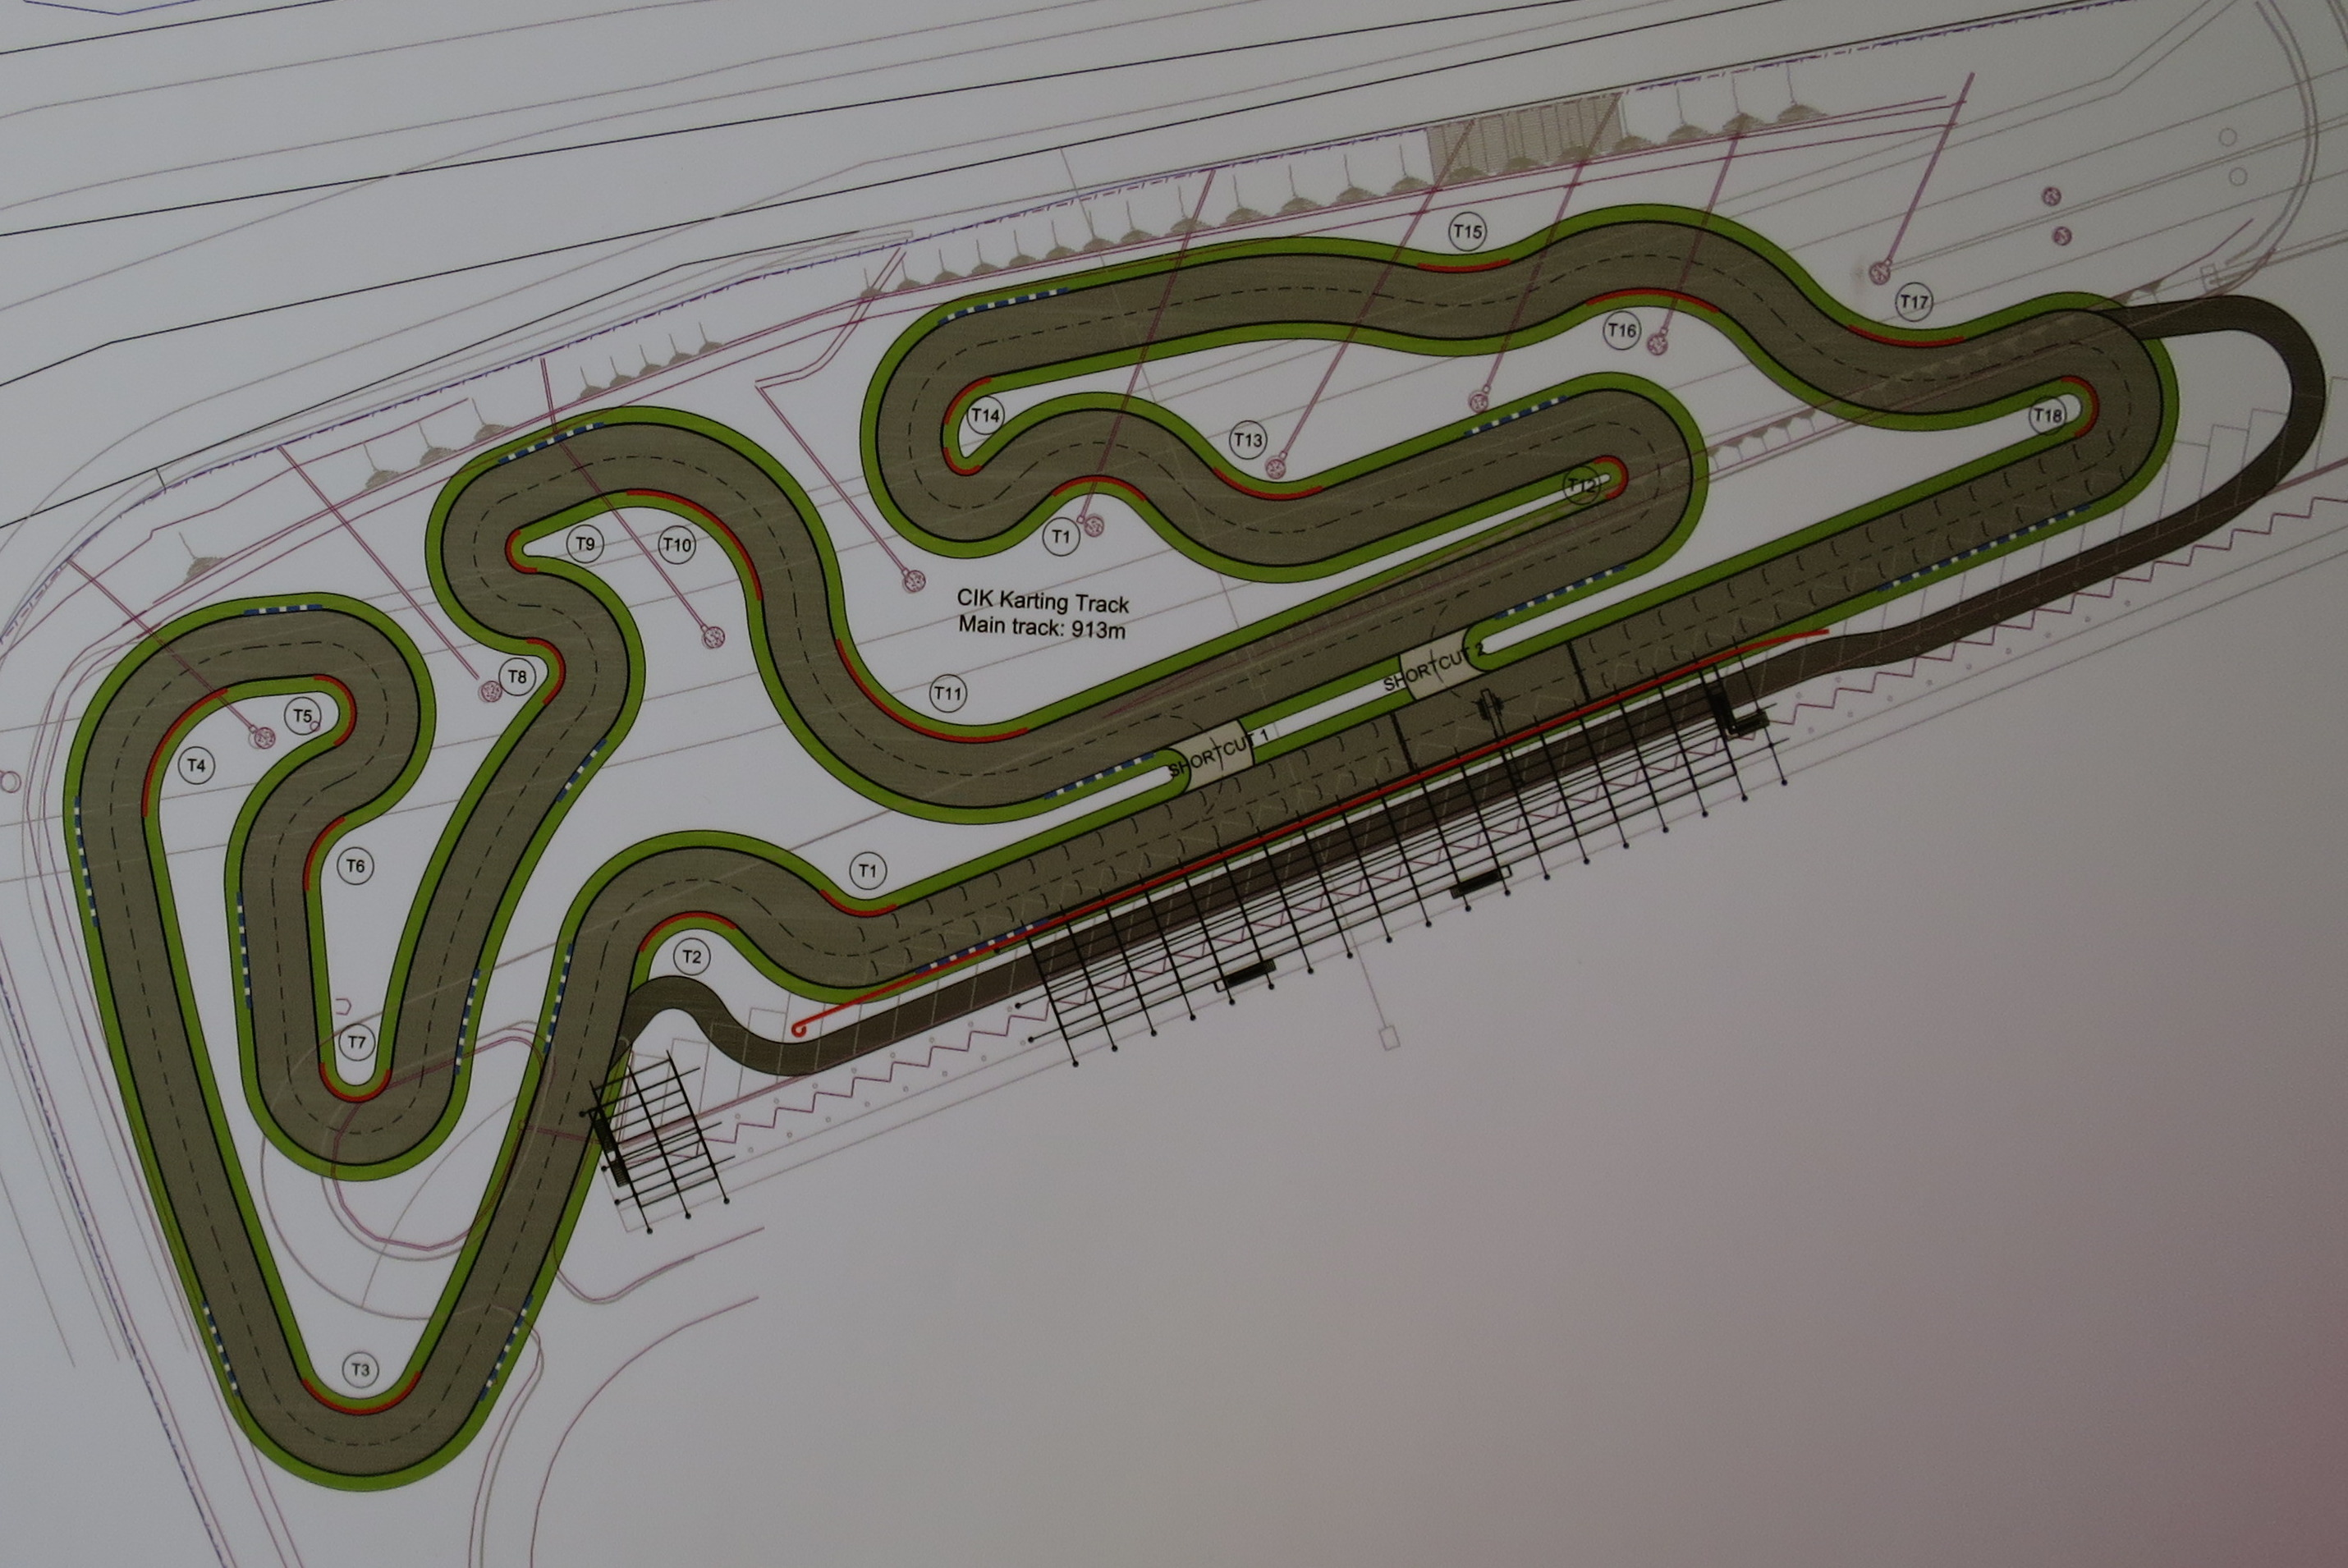 KF1 track layout